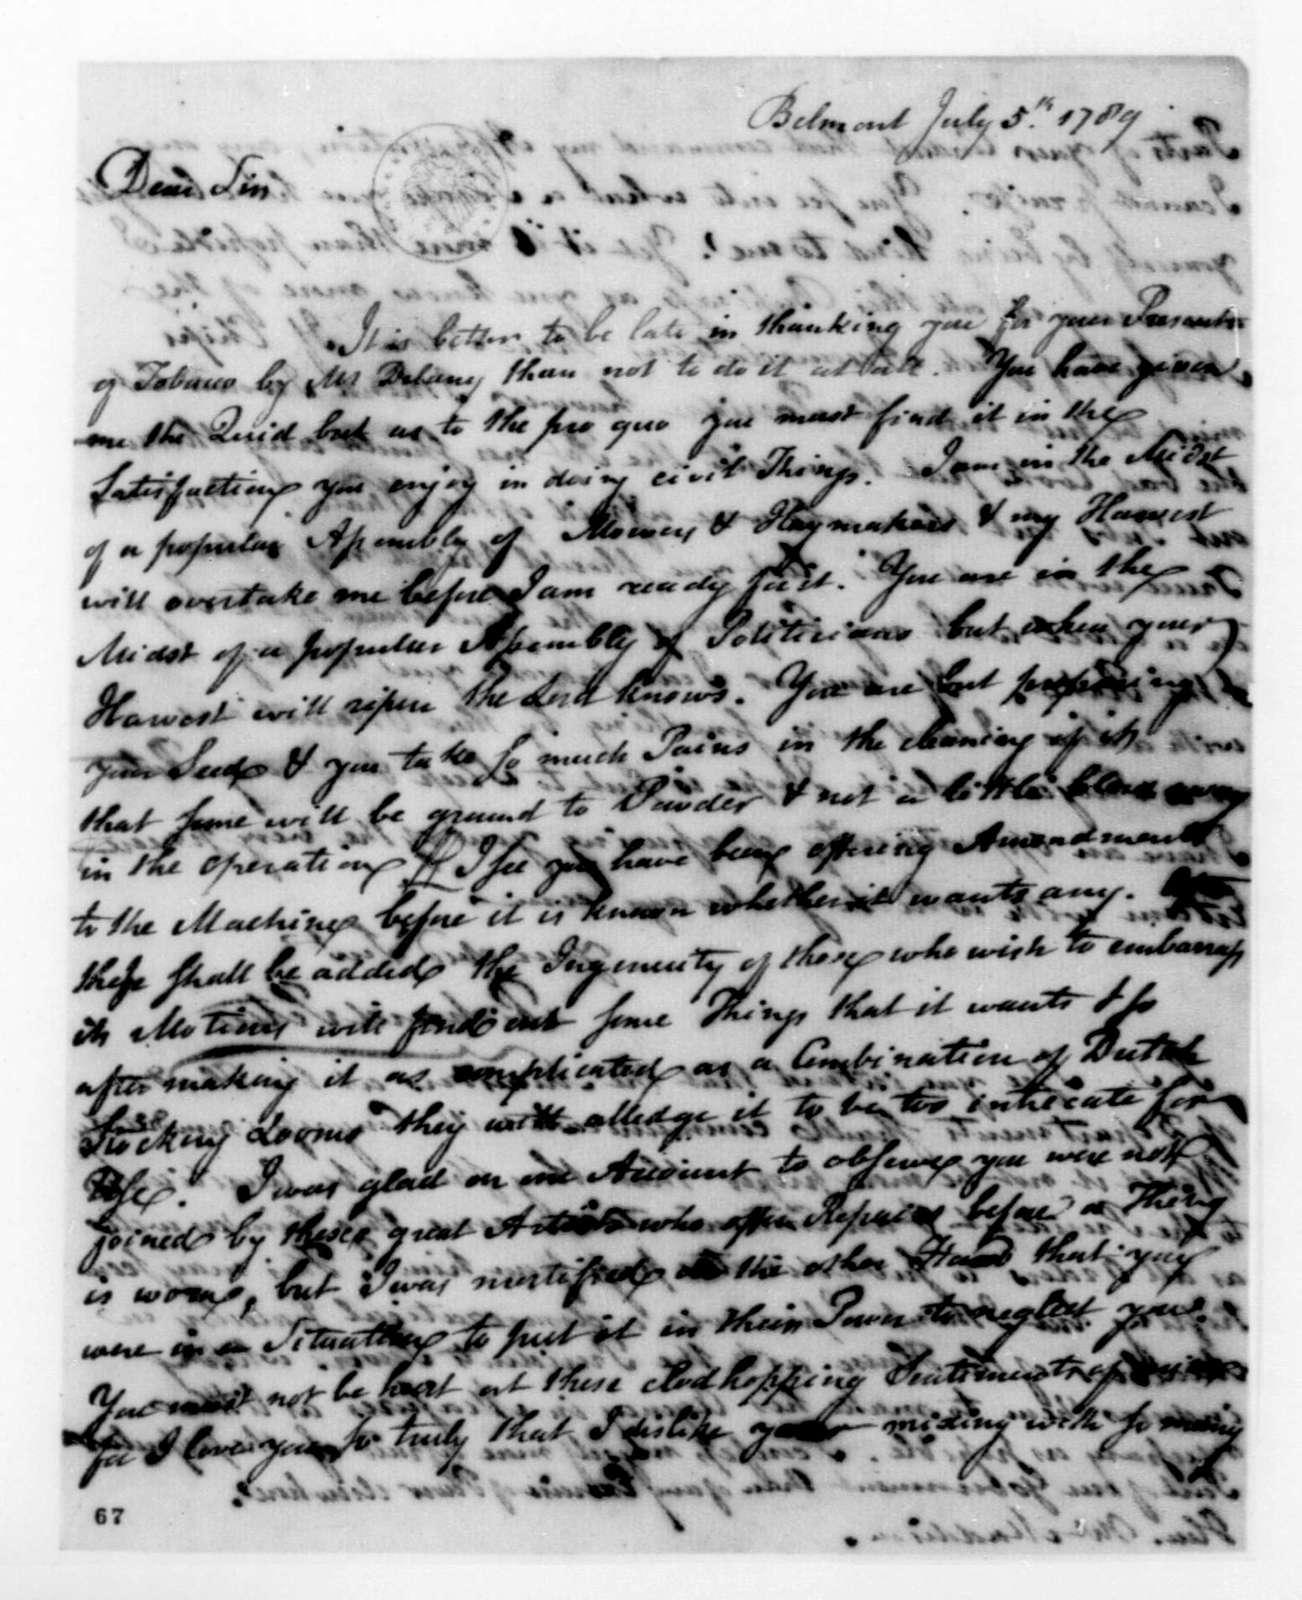 Richard Peters to James Madison, July 5, 1789.